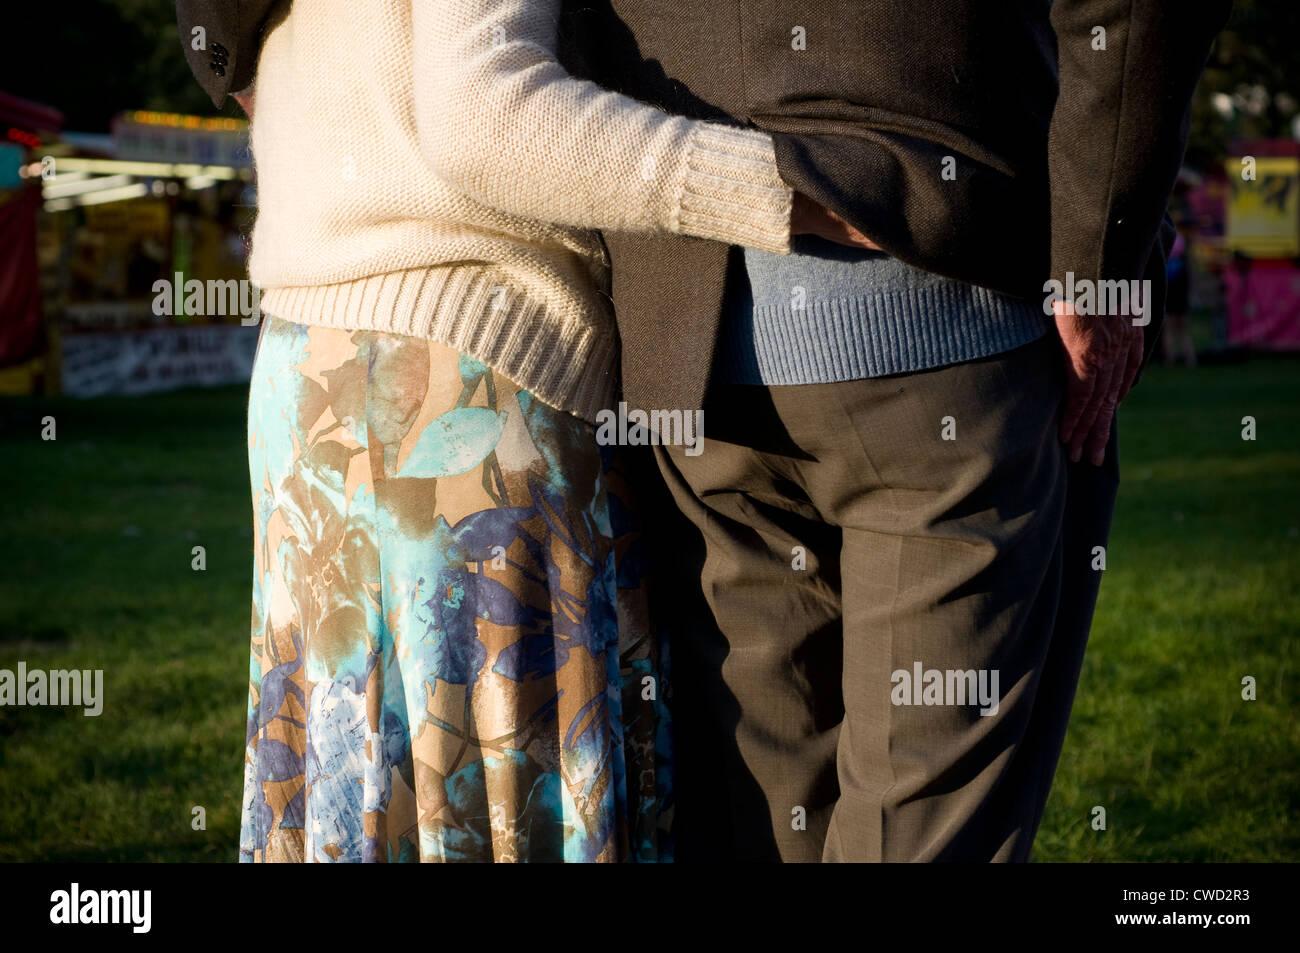 Elderly couple embrace,pickpocket,saga,cuddle,pensioner, adult, arm, back, care, couple, elderly, ,3rd age,ELSA - Stock Image